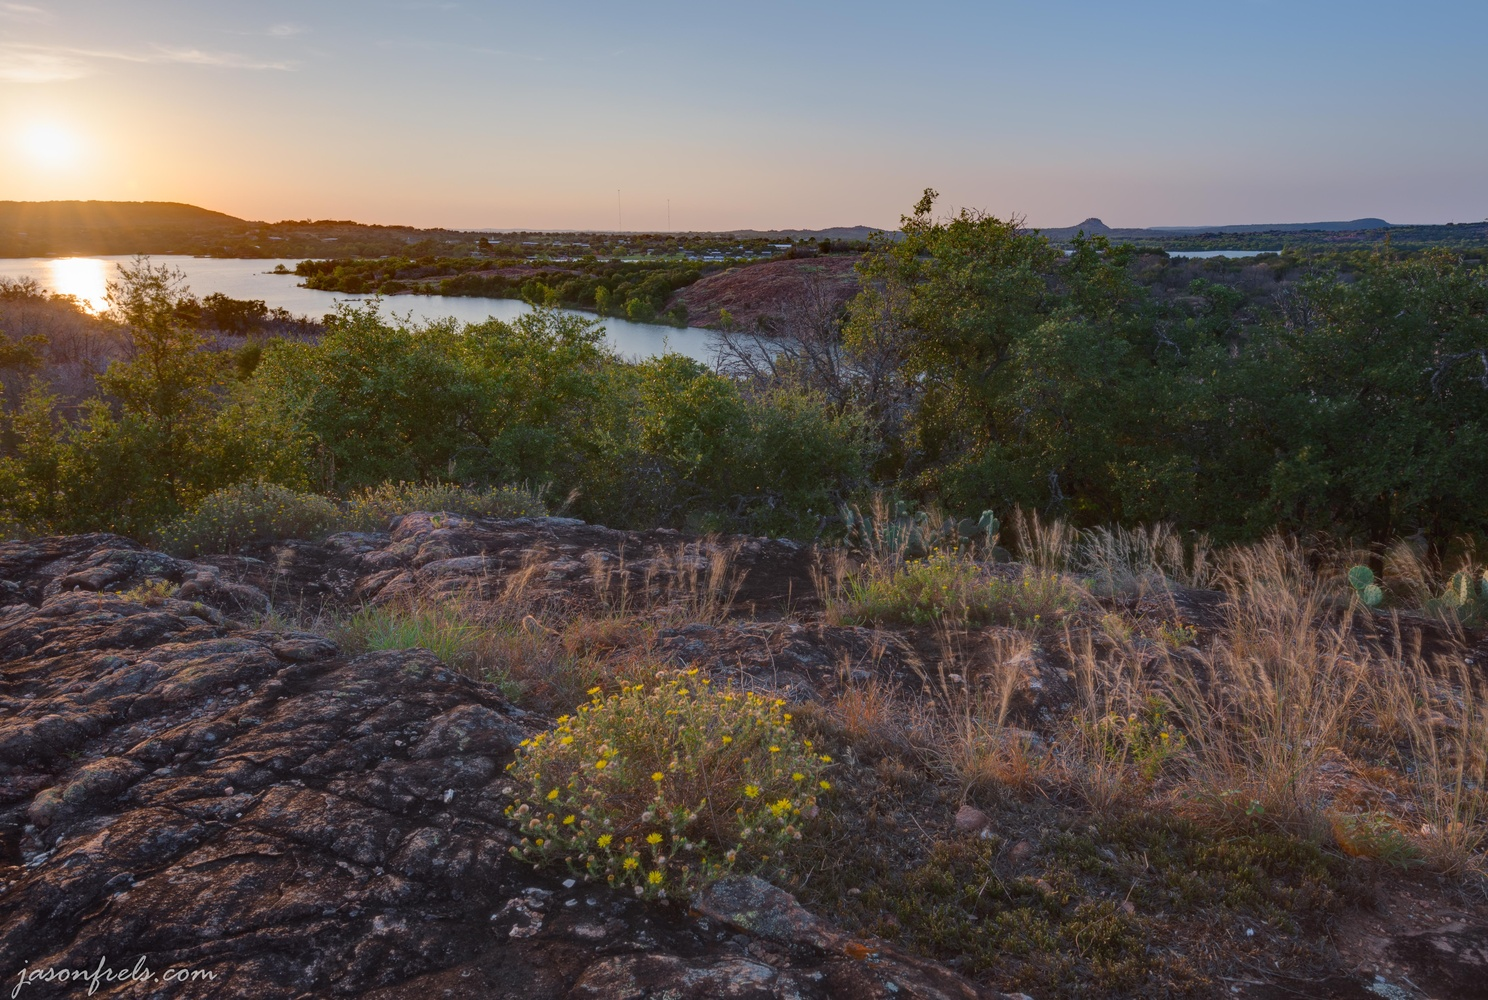 Sunset at Inks Lake by Jason Frels